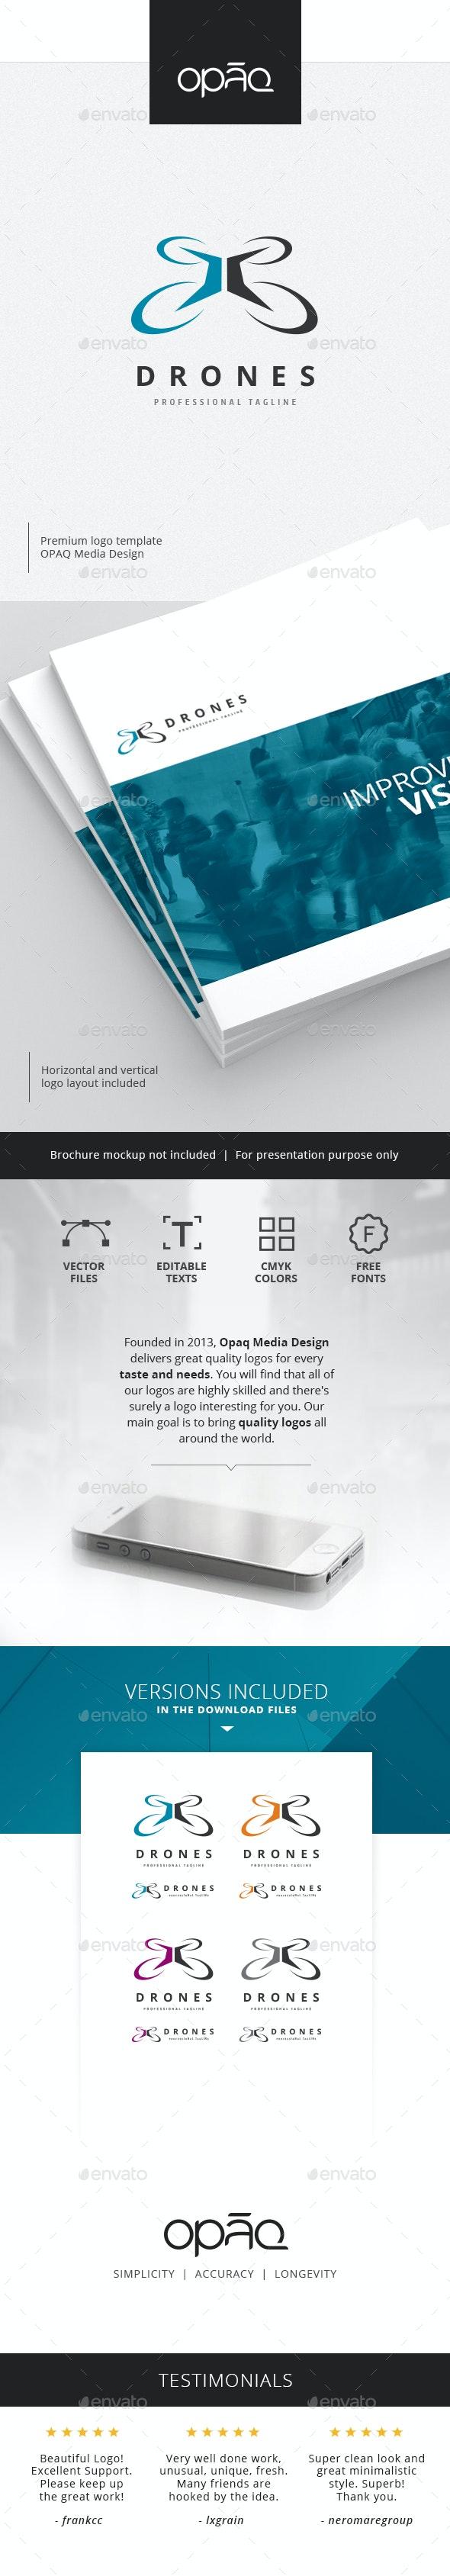 Drone Expert Logo - Objects Logo Templates